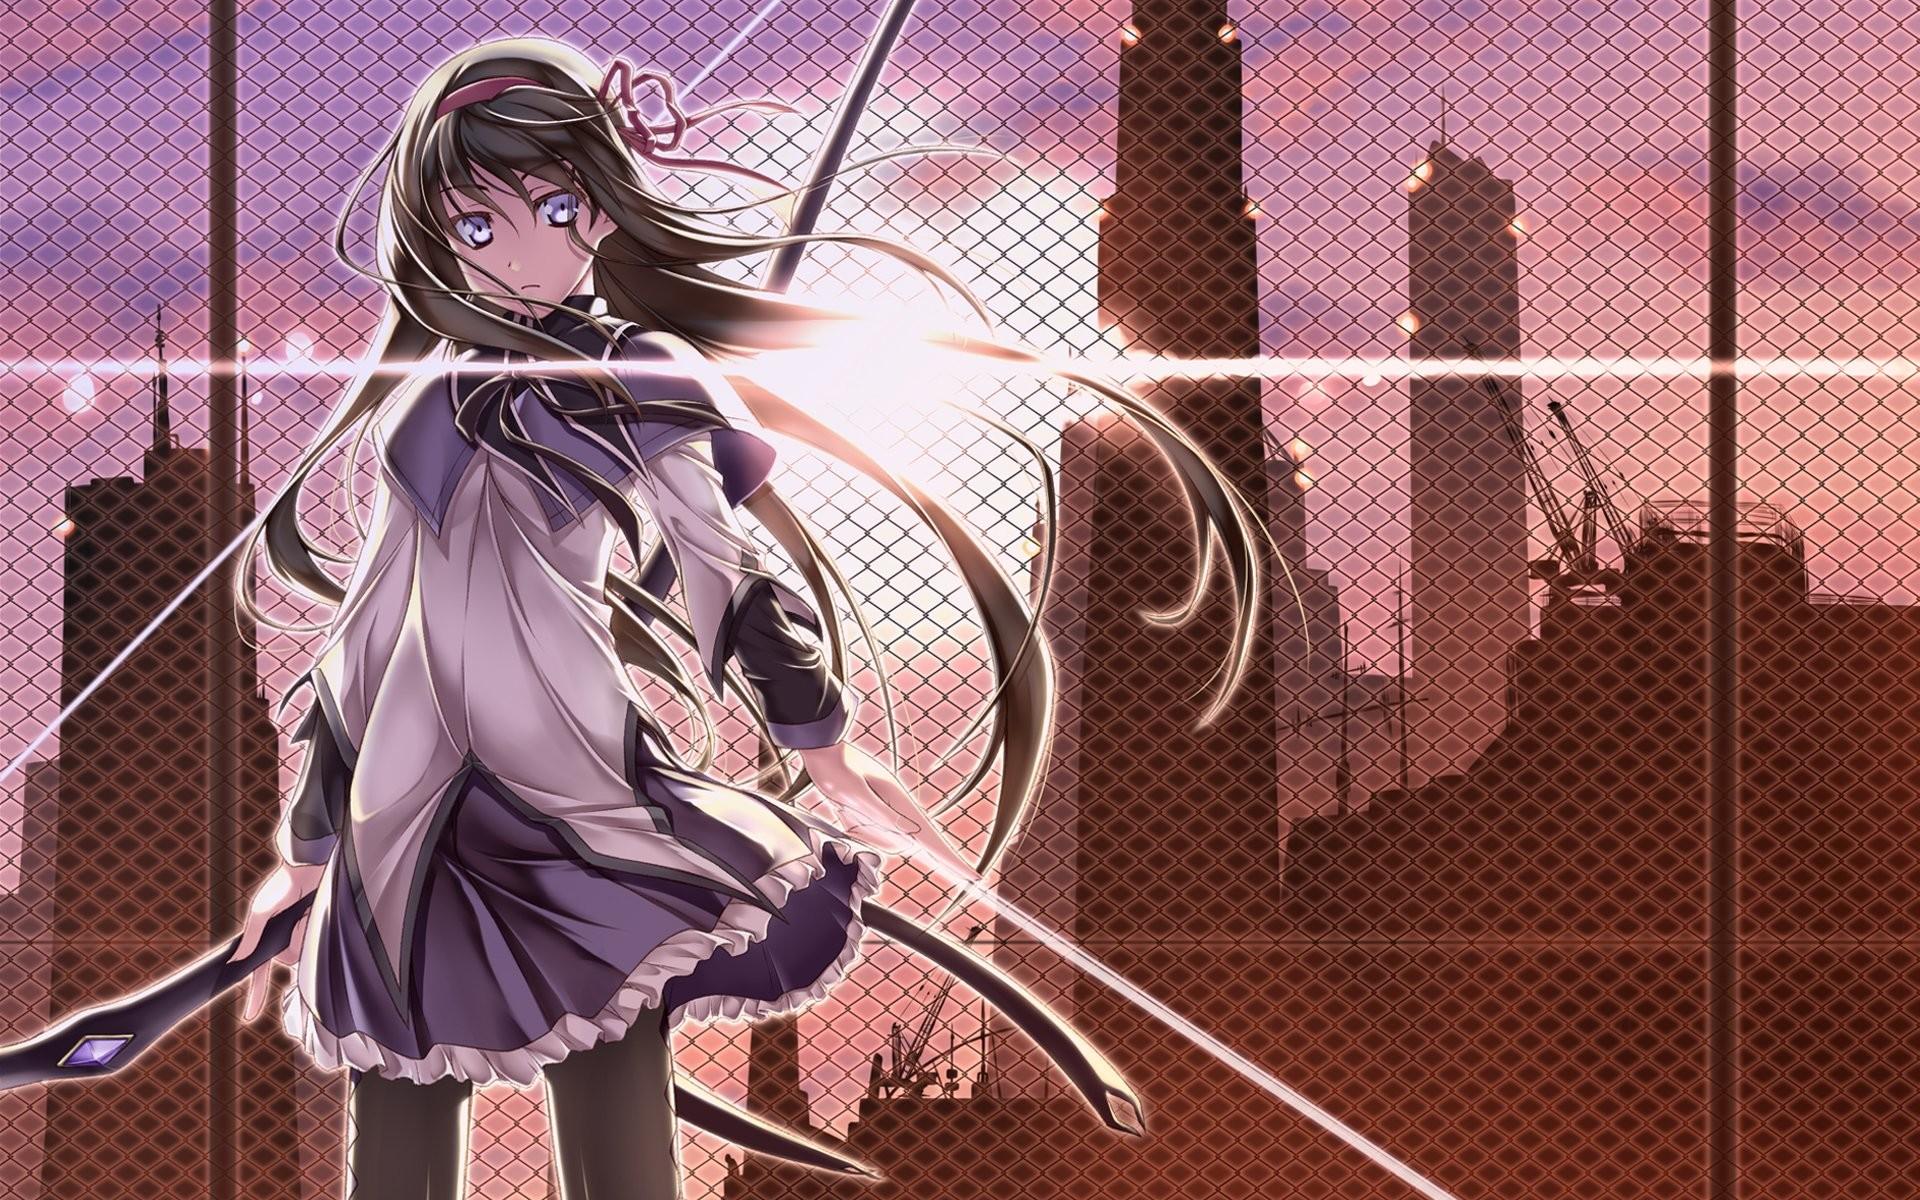 Brunettes cityscapes Mahou Shoujo Madoka Magica anime Akemi Homura anime  girls bow (weapon) wallpaper     275242   WallpaperUP